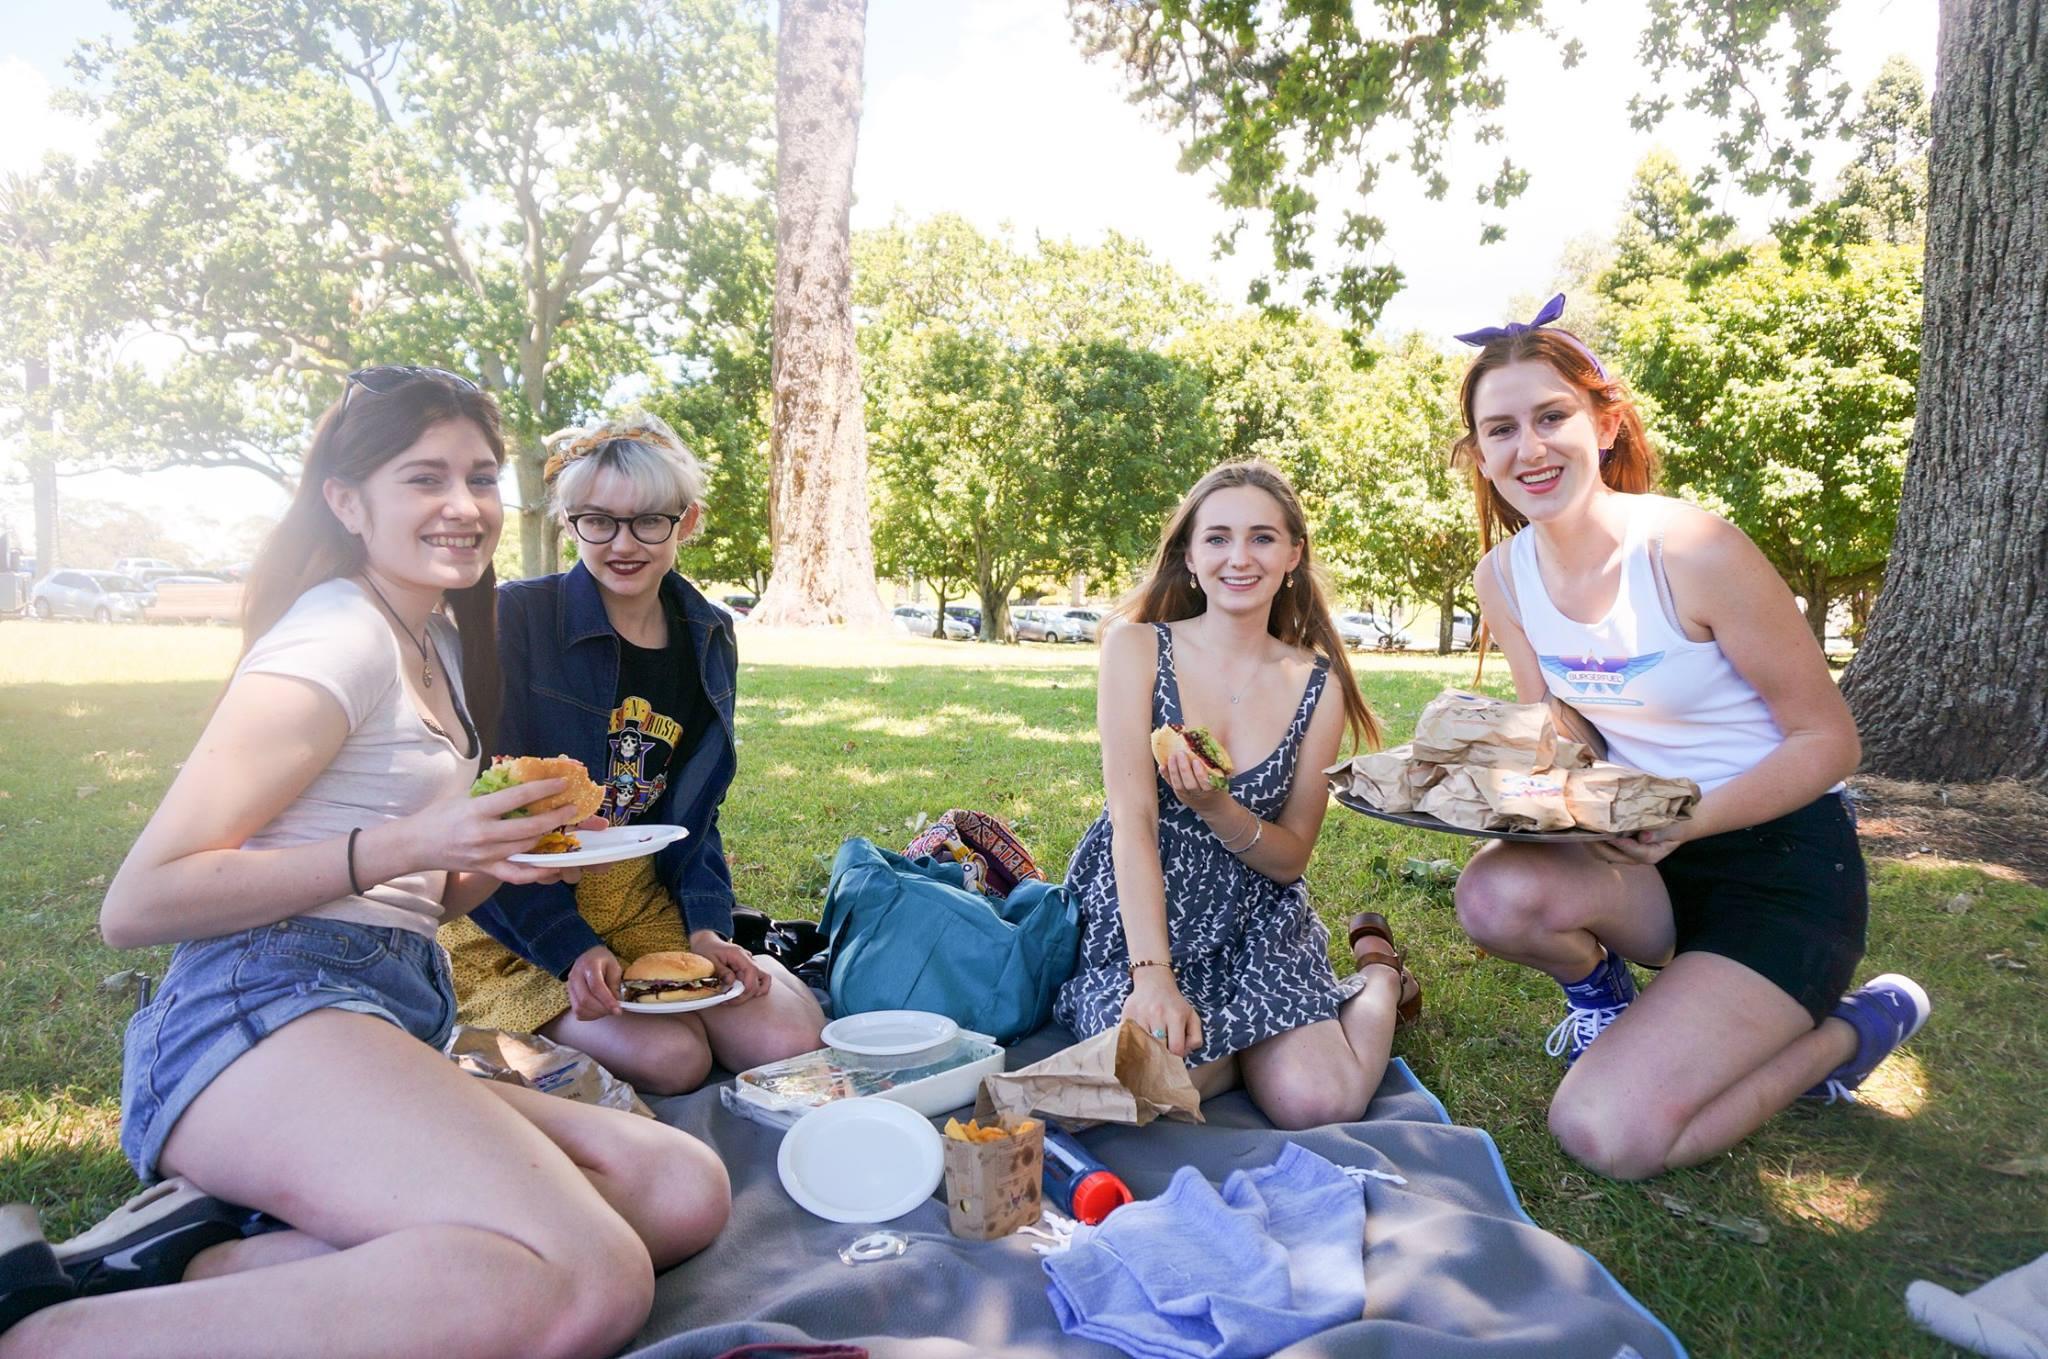 picnic 1.jpg